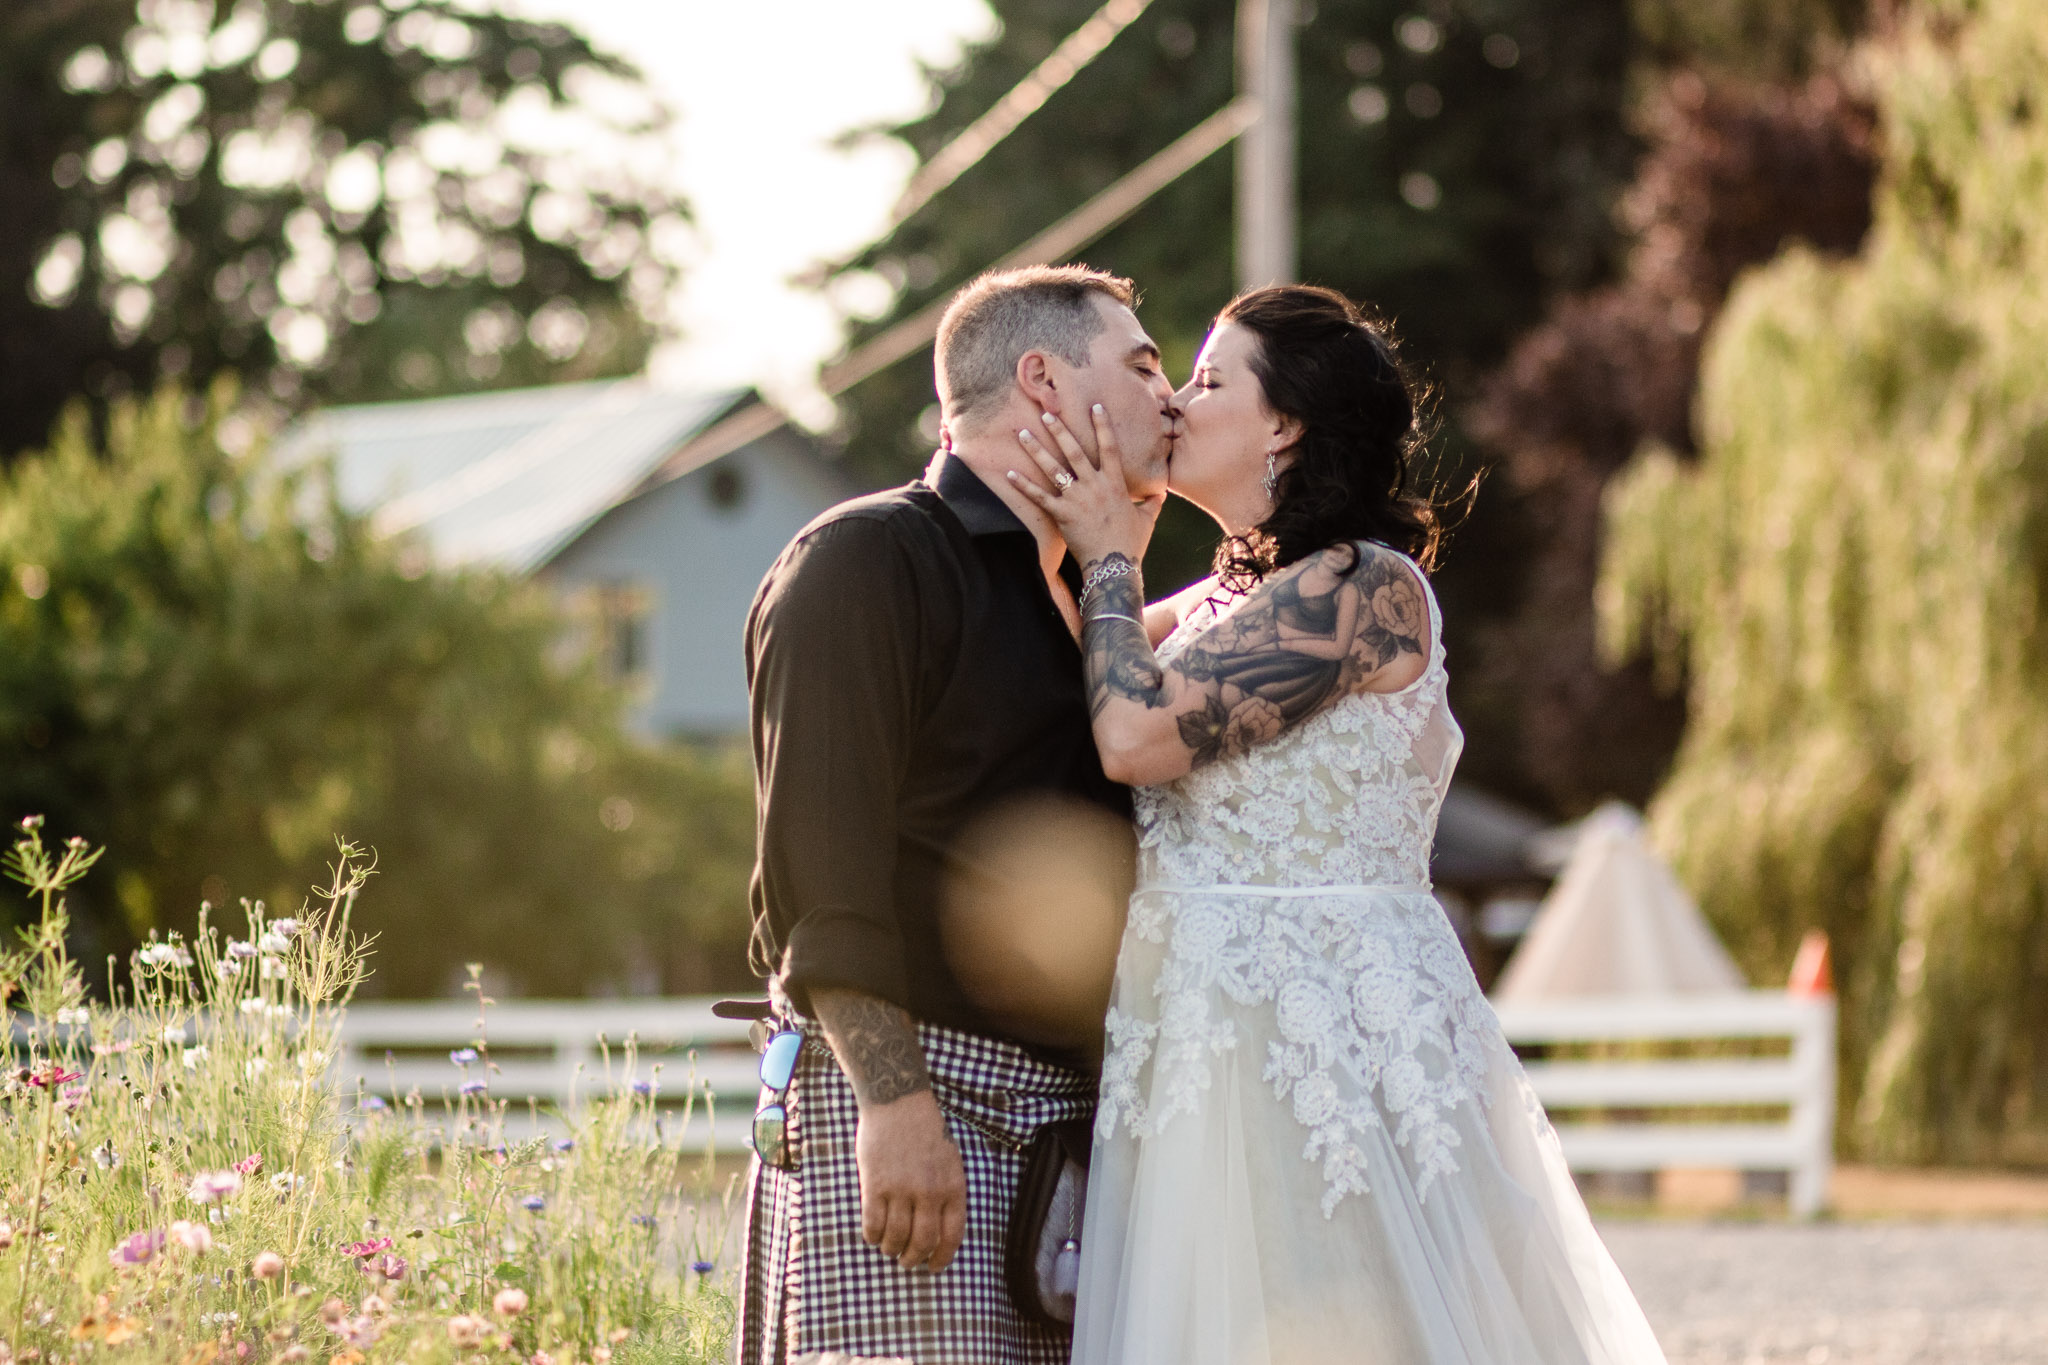 White-Owl-Barn-Langley-Wedding-Photographer-Rustic-Scottish-Country-Food-Truck-Documentary-Open-Bar-Wedding-1263.jpg